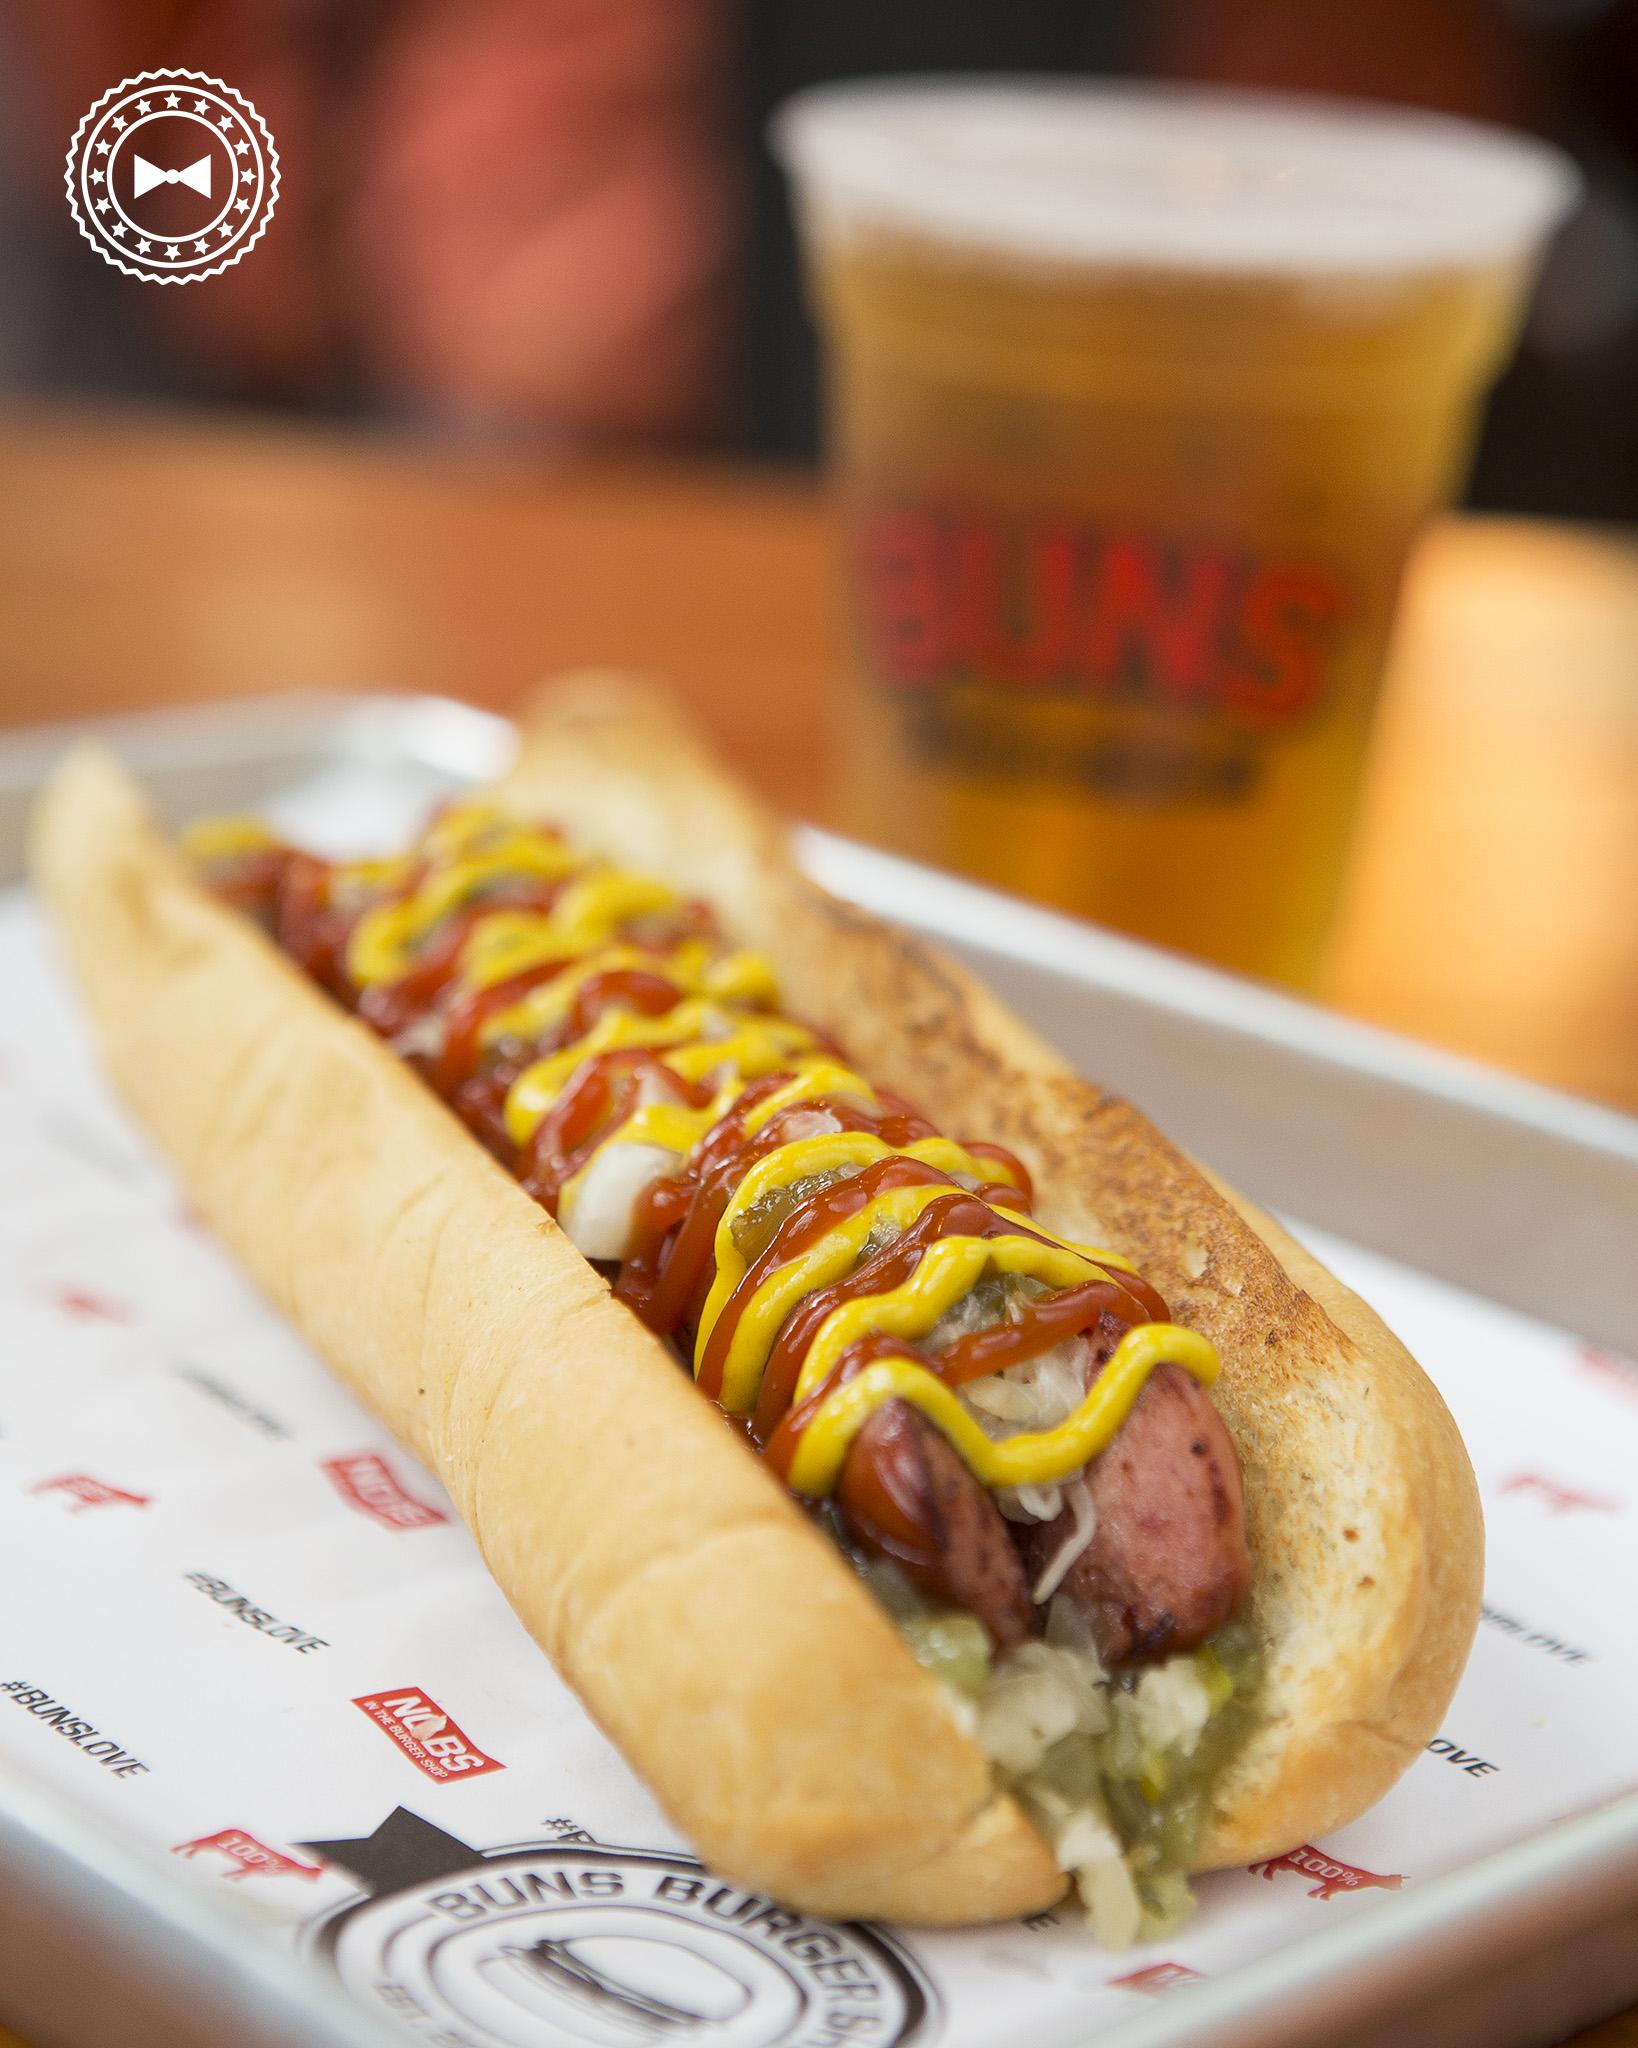 Hot dog con cebolla, sauerkraut, relish, mostaza y ketchup  • #BUNSLove